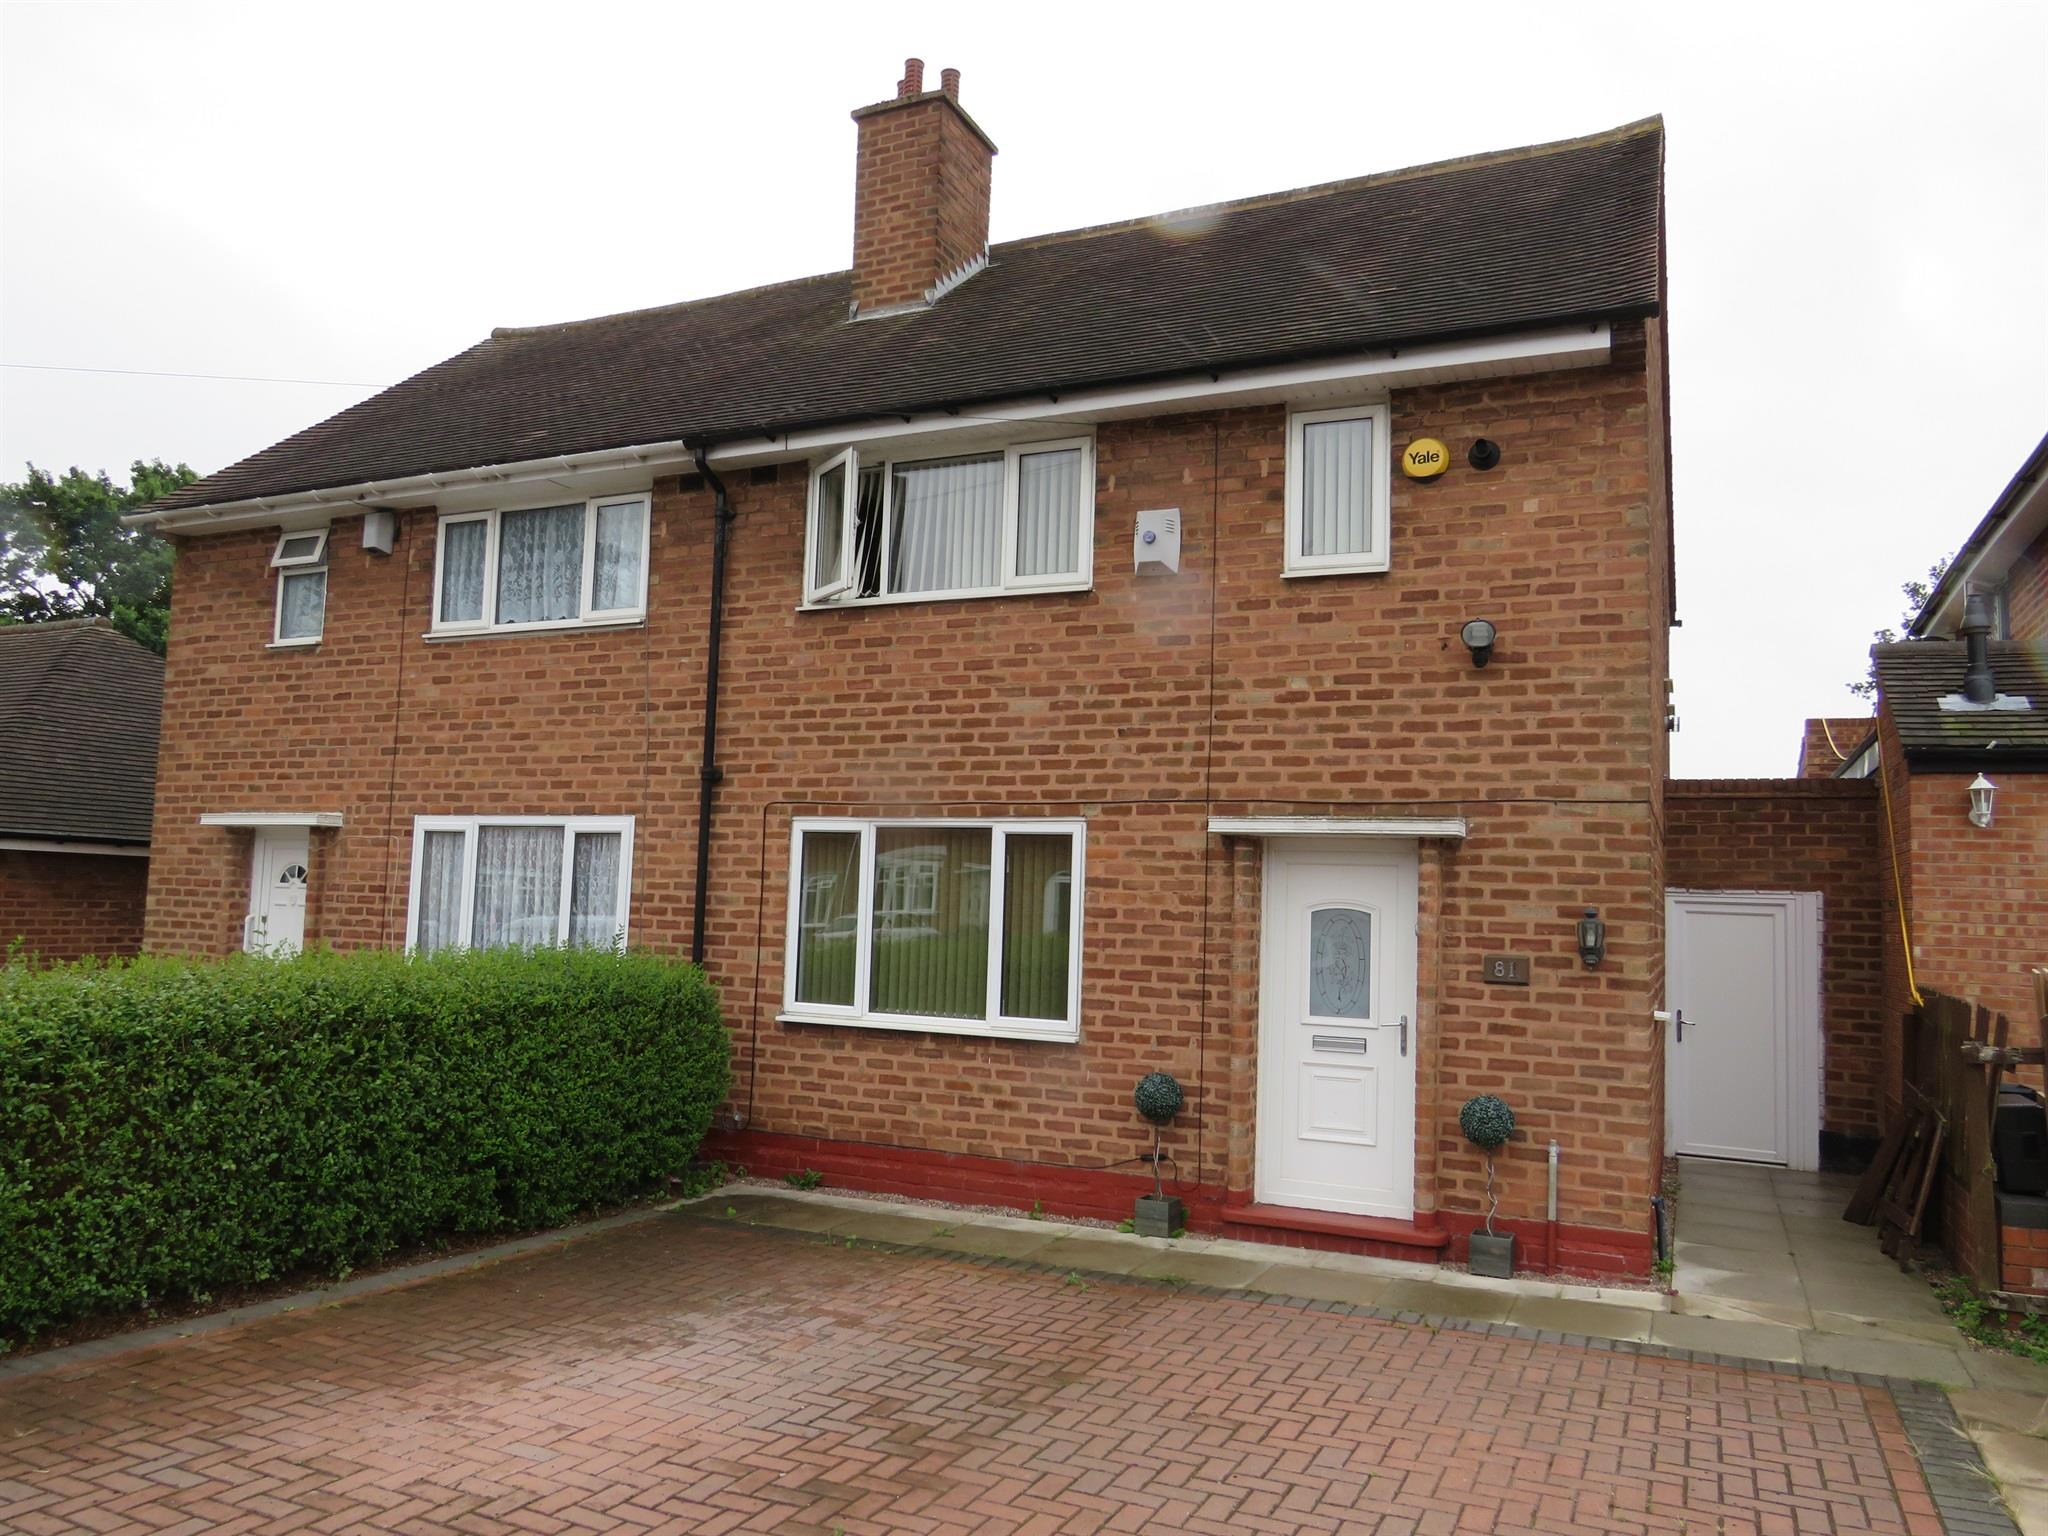 2 Bedroom Semi Detached House For Sale Thistledown Road Birmingham B34 7ee